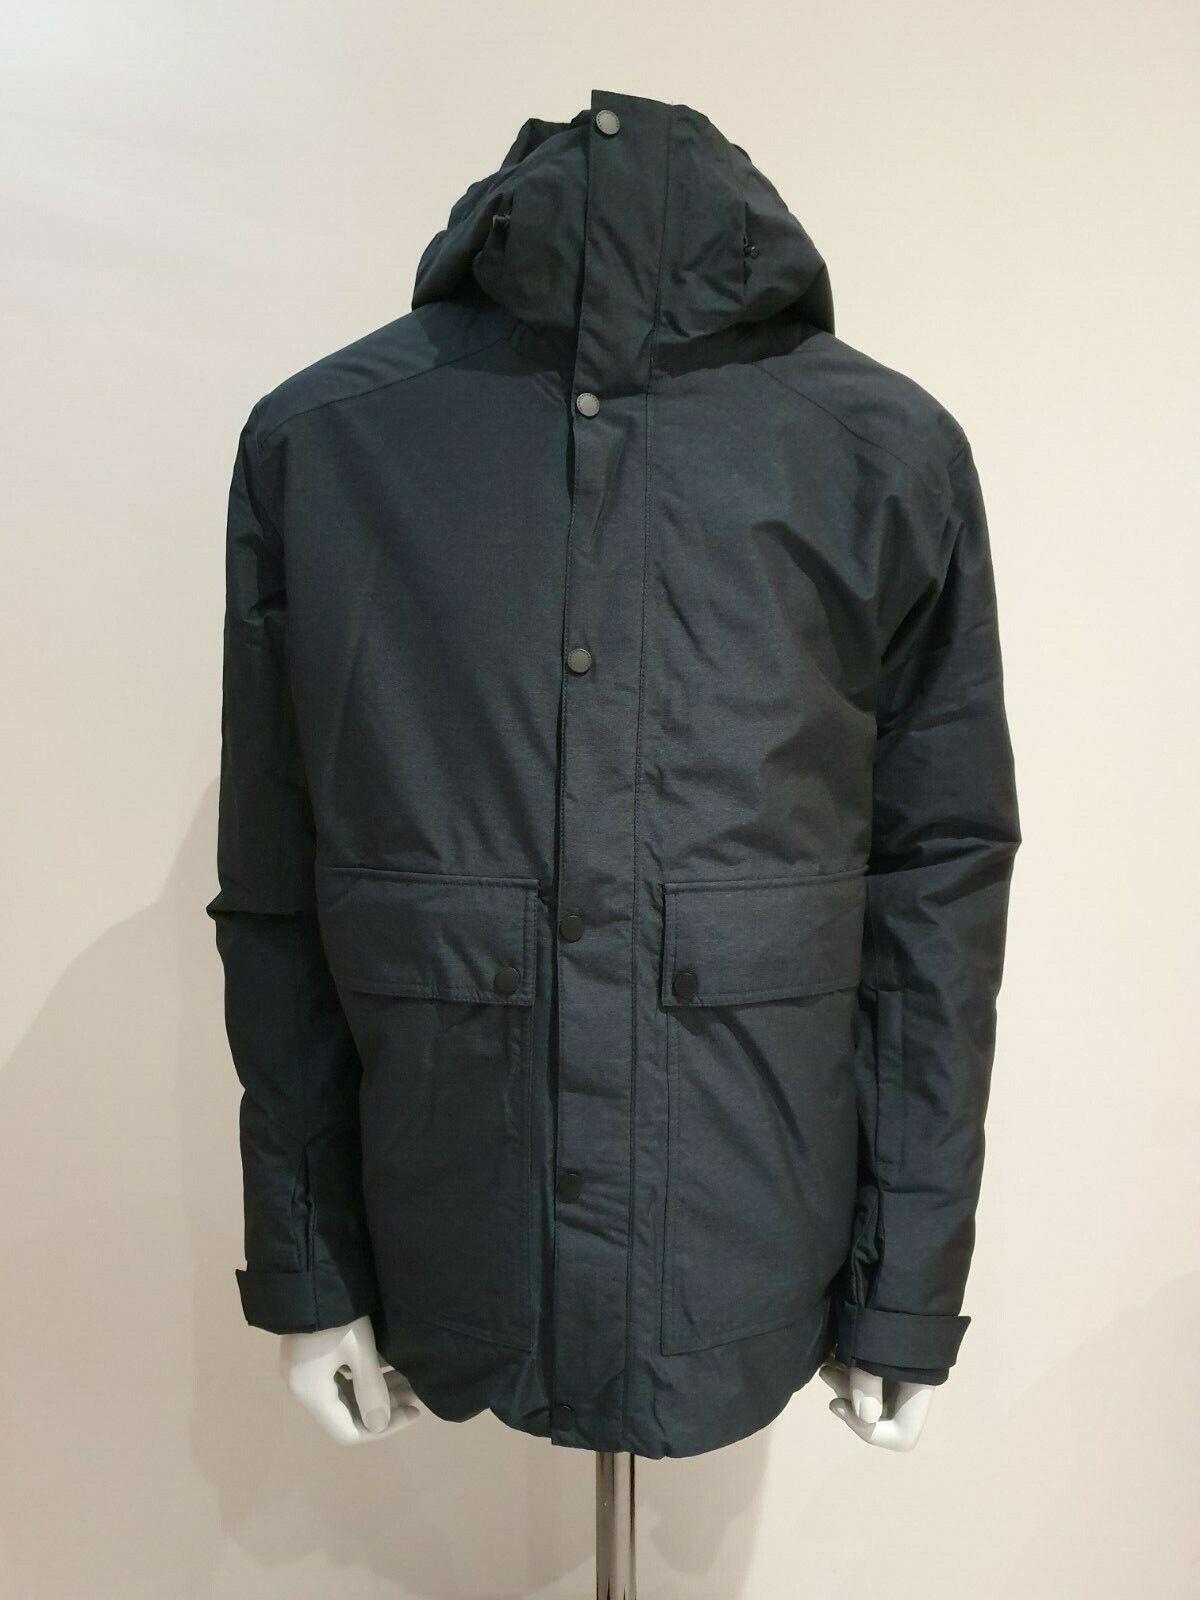 Mens Peak Performance Verge Jacket - Größe Medium